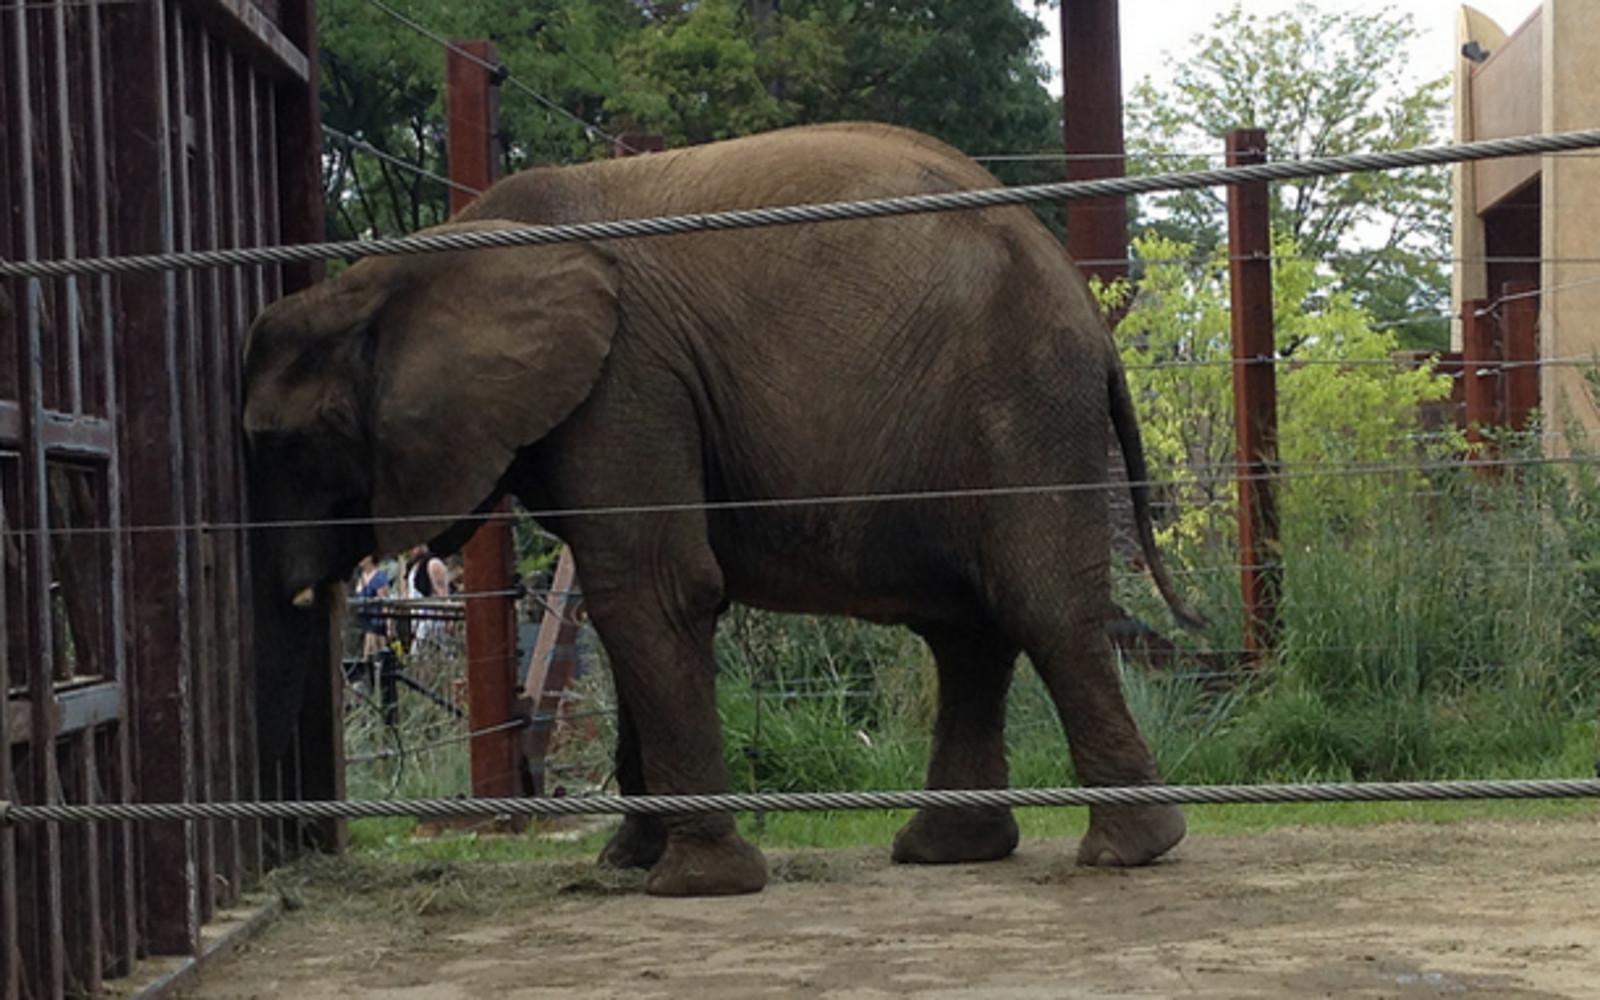 Elephants Will Never Belong in Zoos